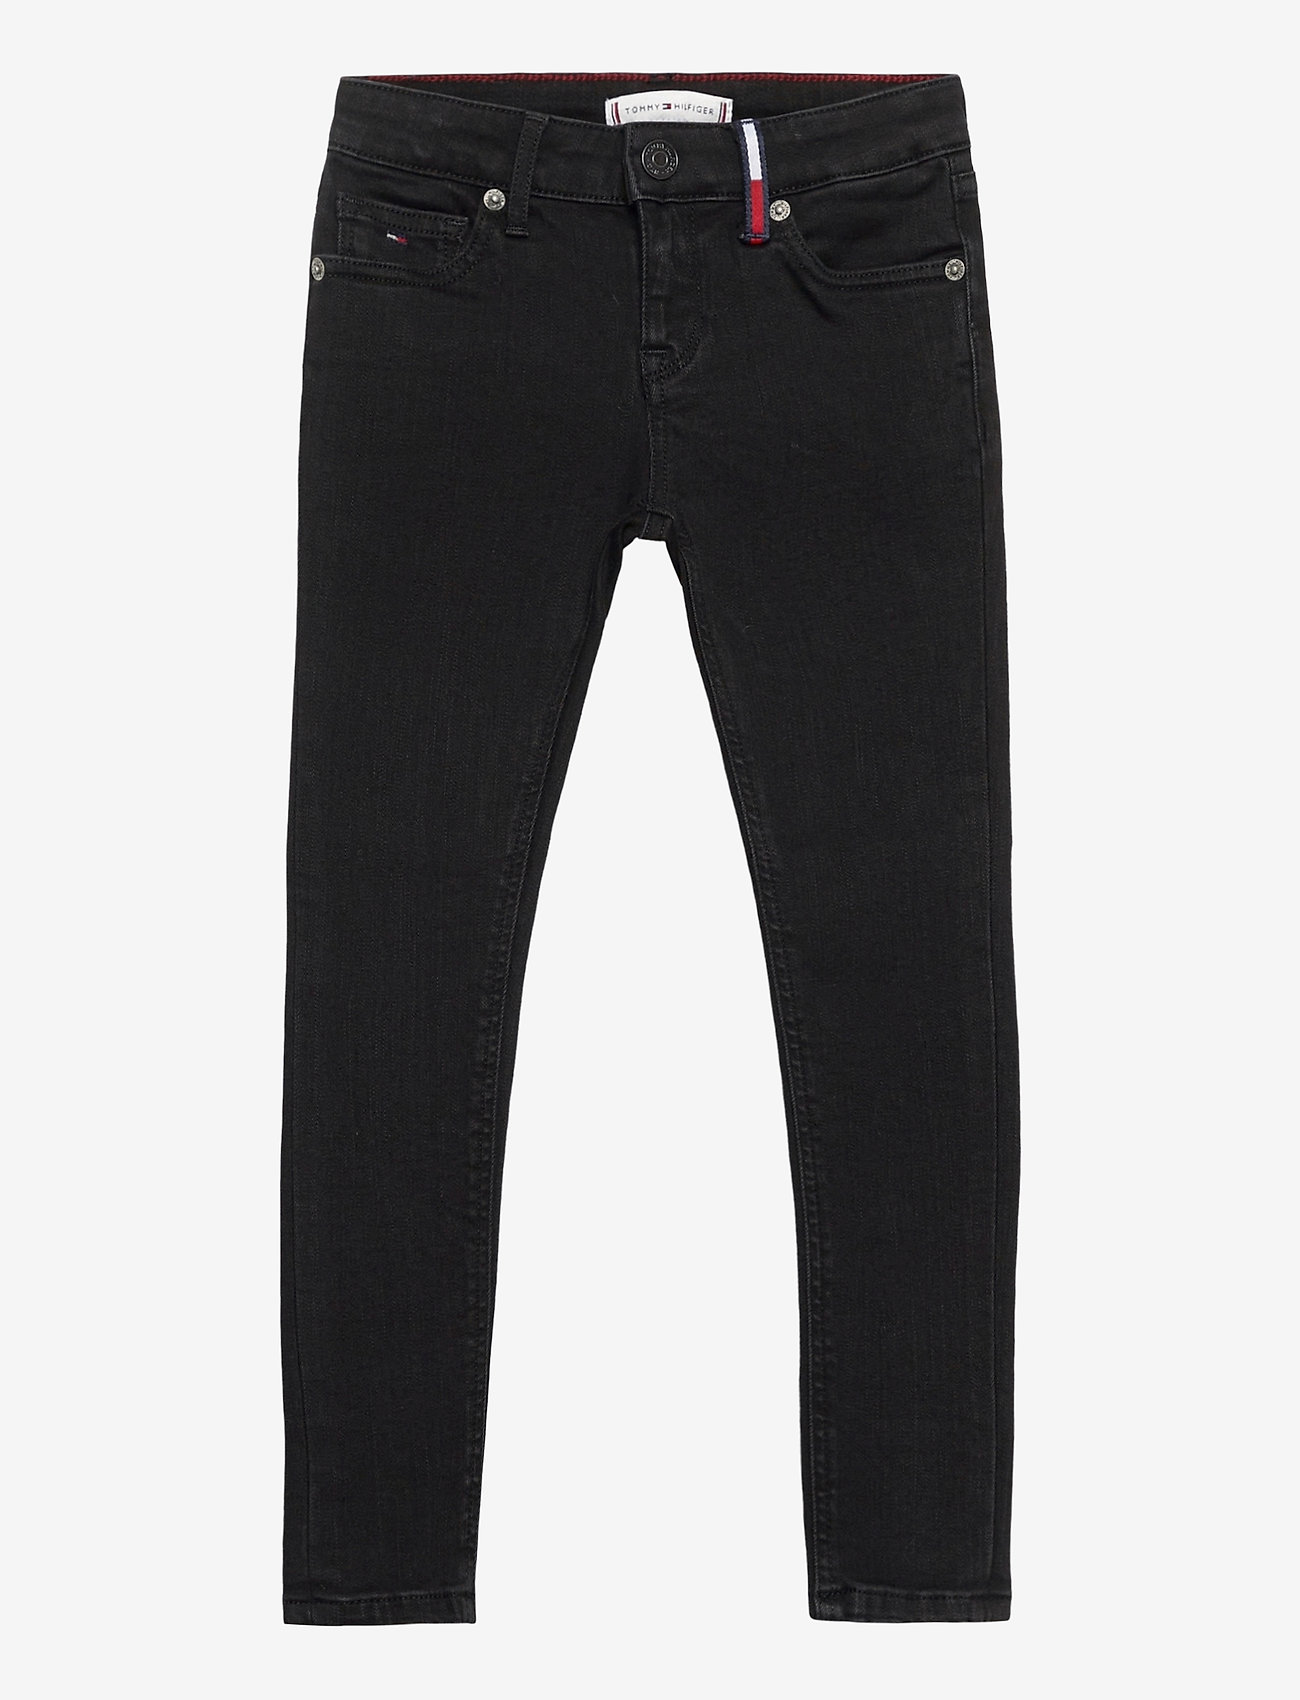 Tommy Hilfiger - NORA SUPER SKINNY WREPLBLS - jeans - waterrepellentblackstr - 0